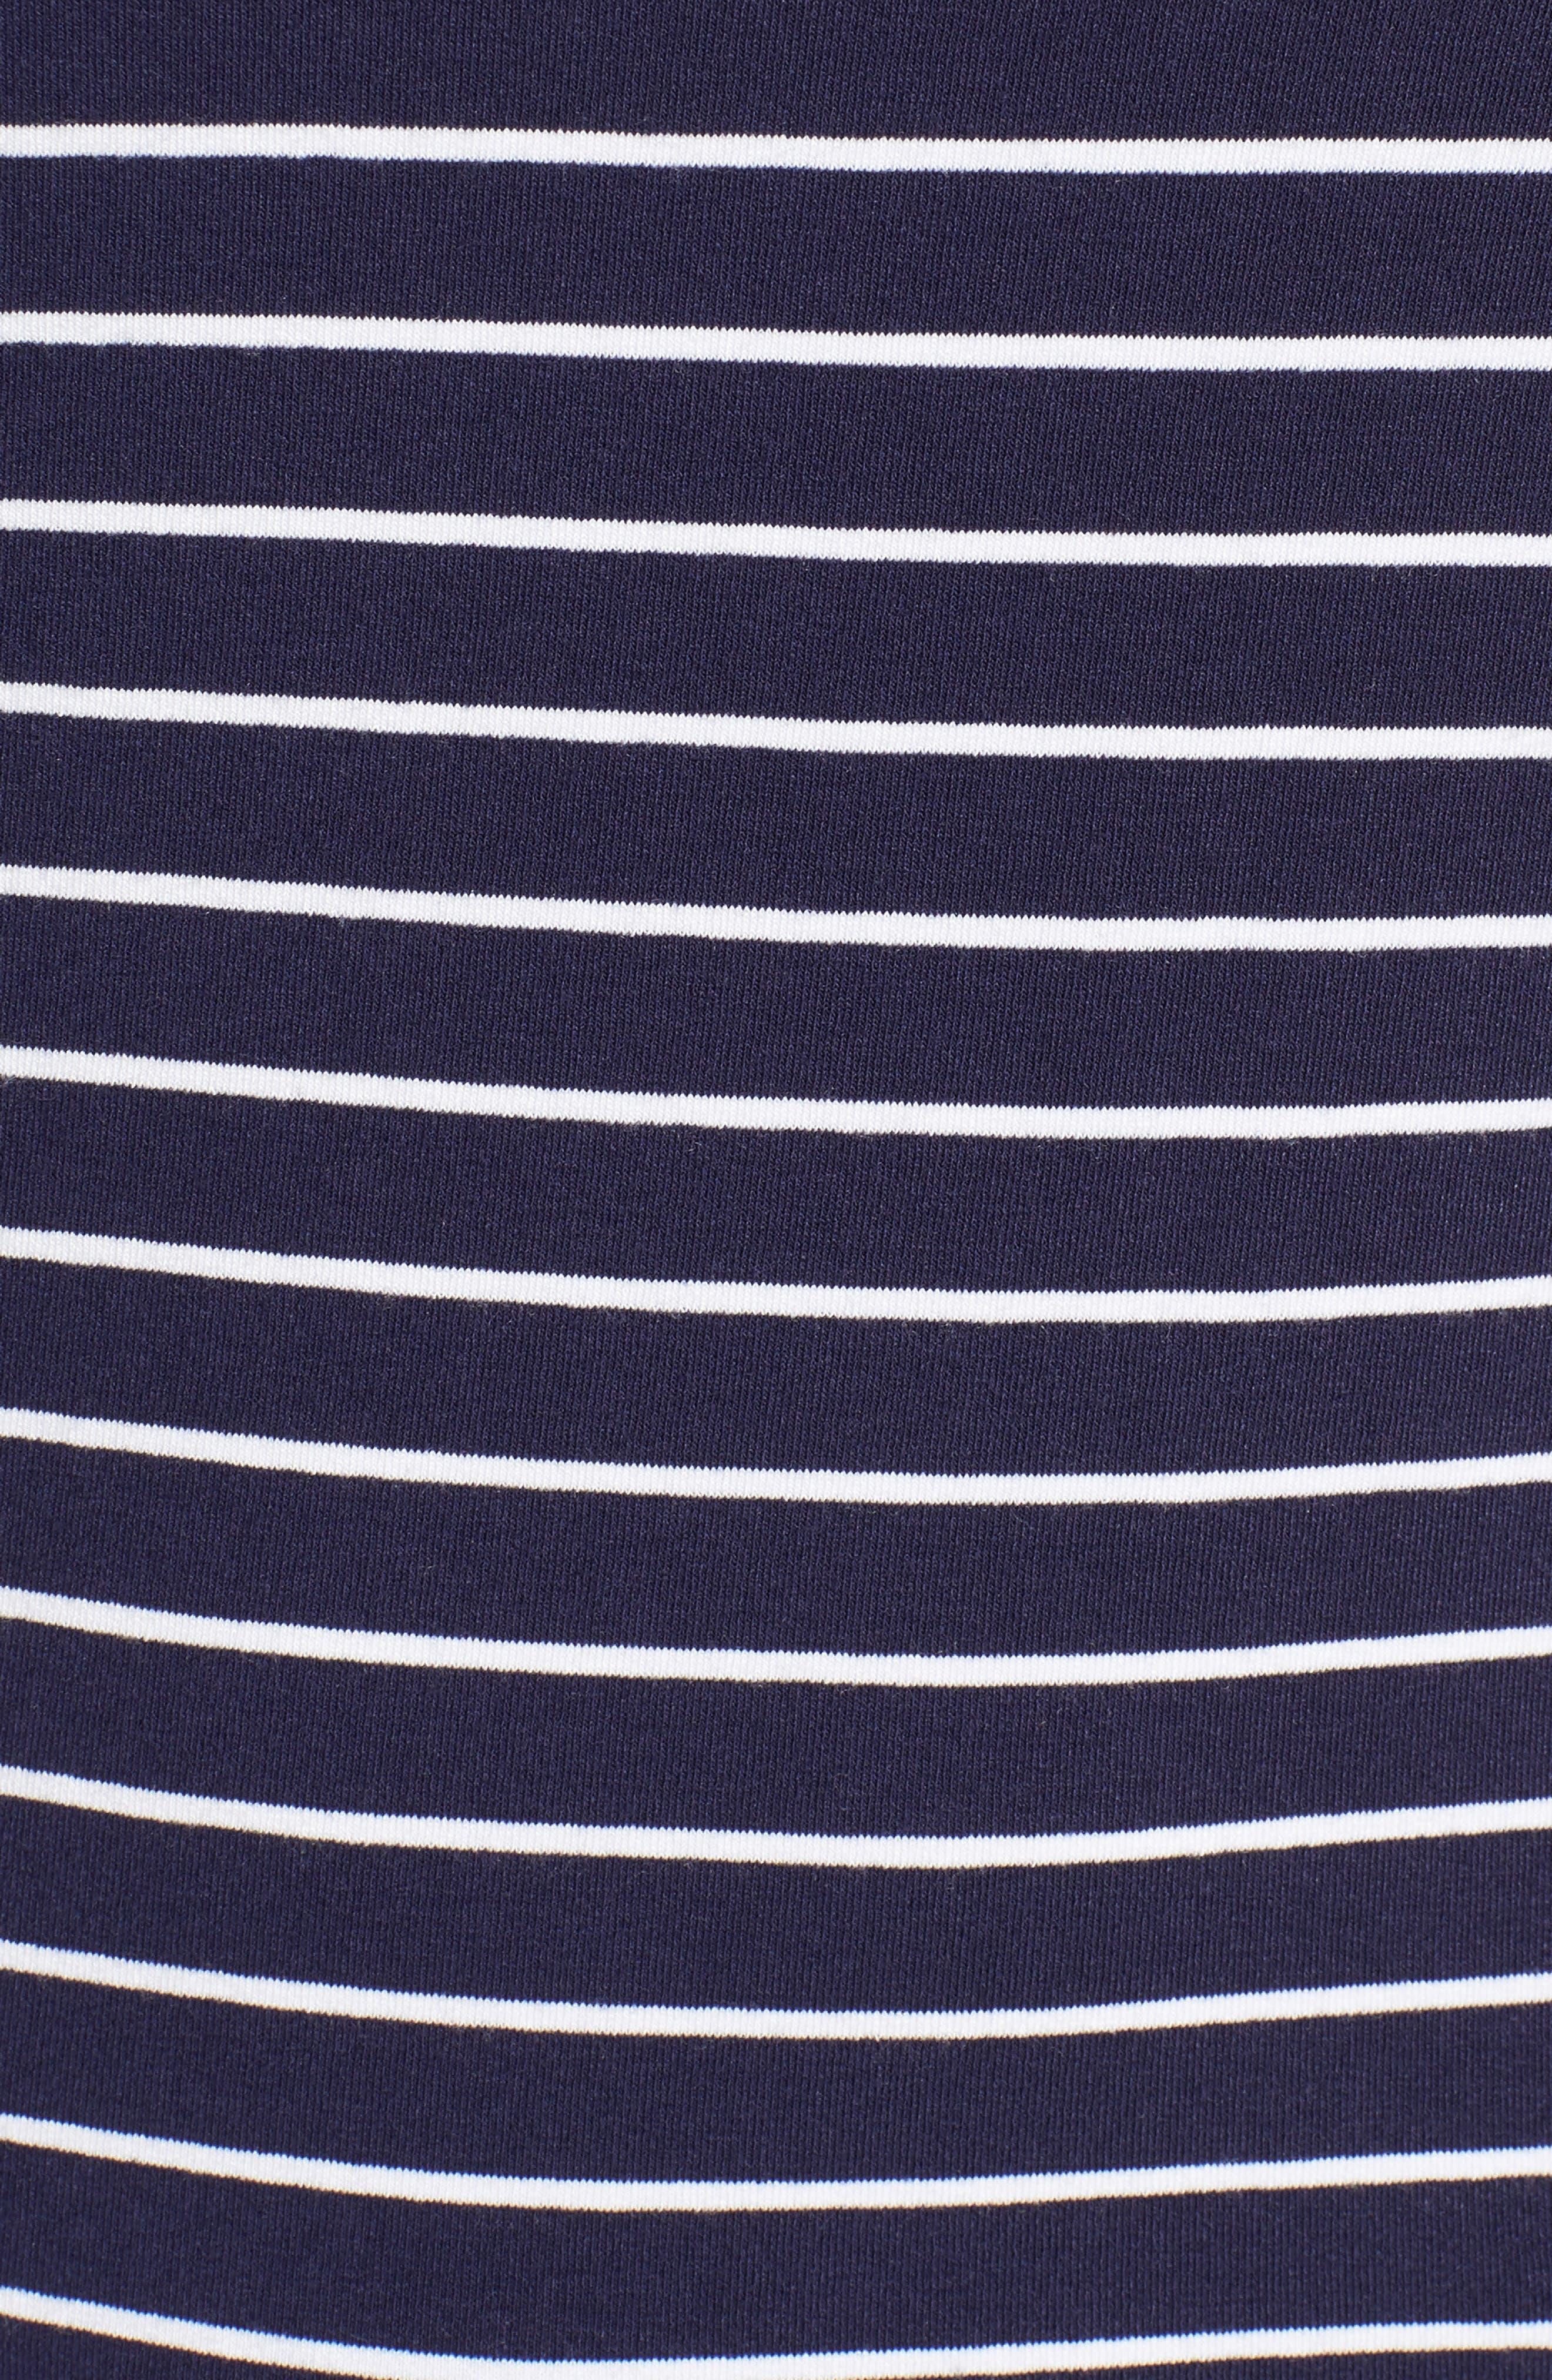 Alternate Image 5  - Nordstrom Signature Long Sleeve Stripe Pocket Tee